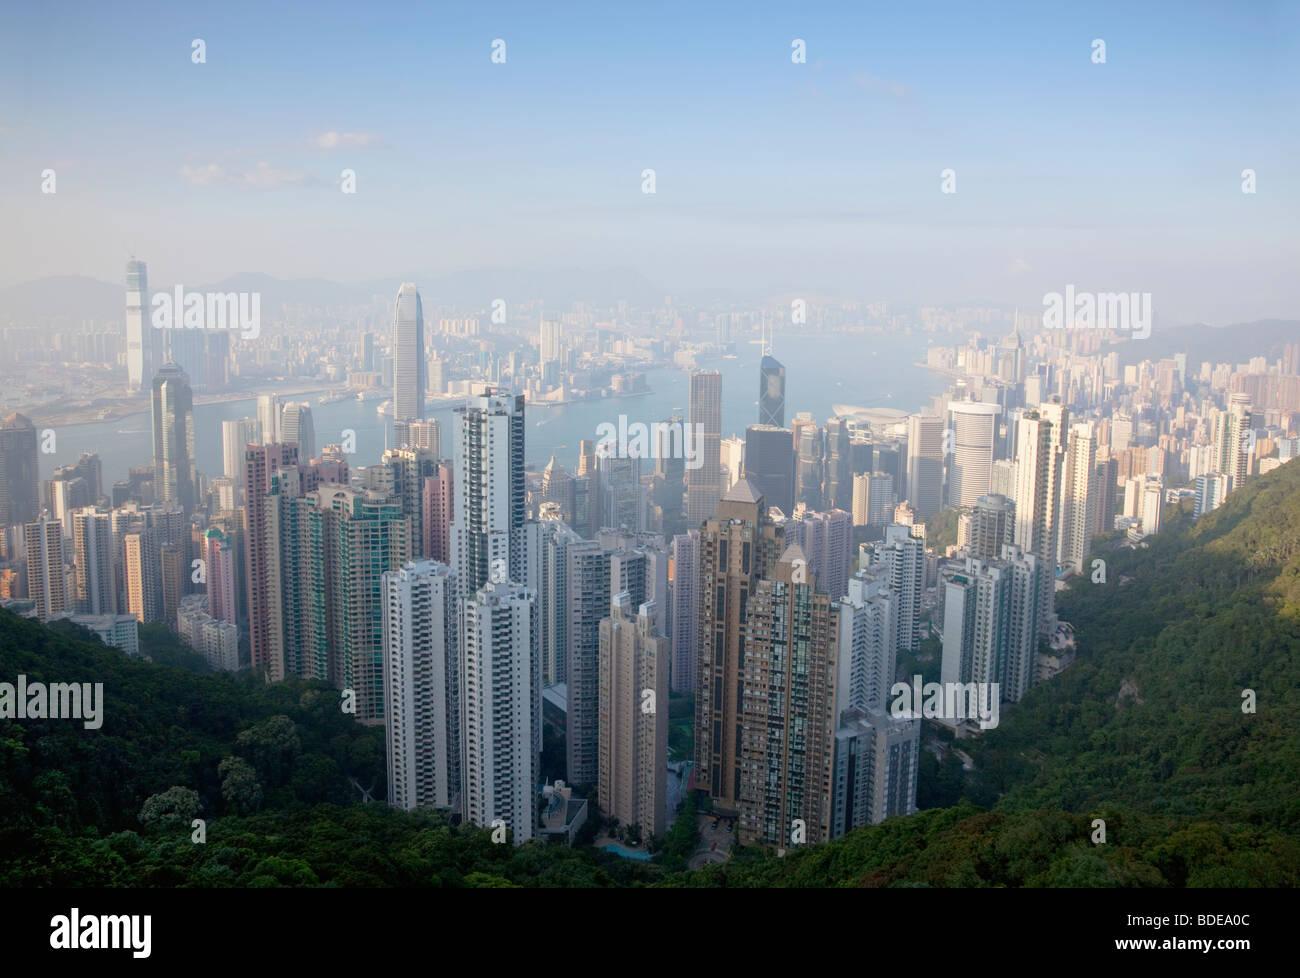 La vista dal picco, Shan Teng, Hong Kong, Cina. Immagini Stock